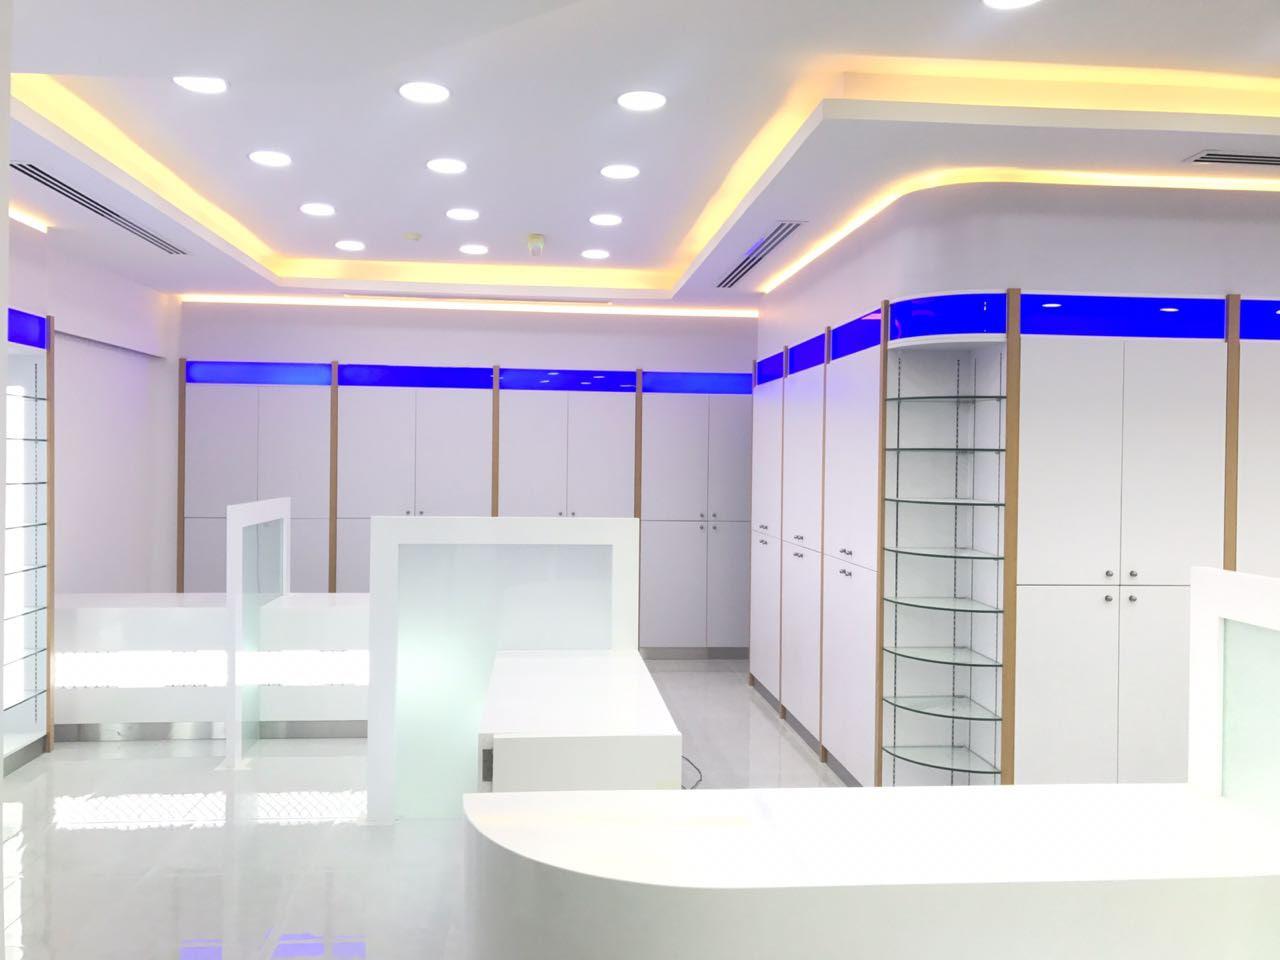 nmc pharmacy interior design fitout company in dubai